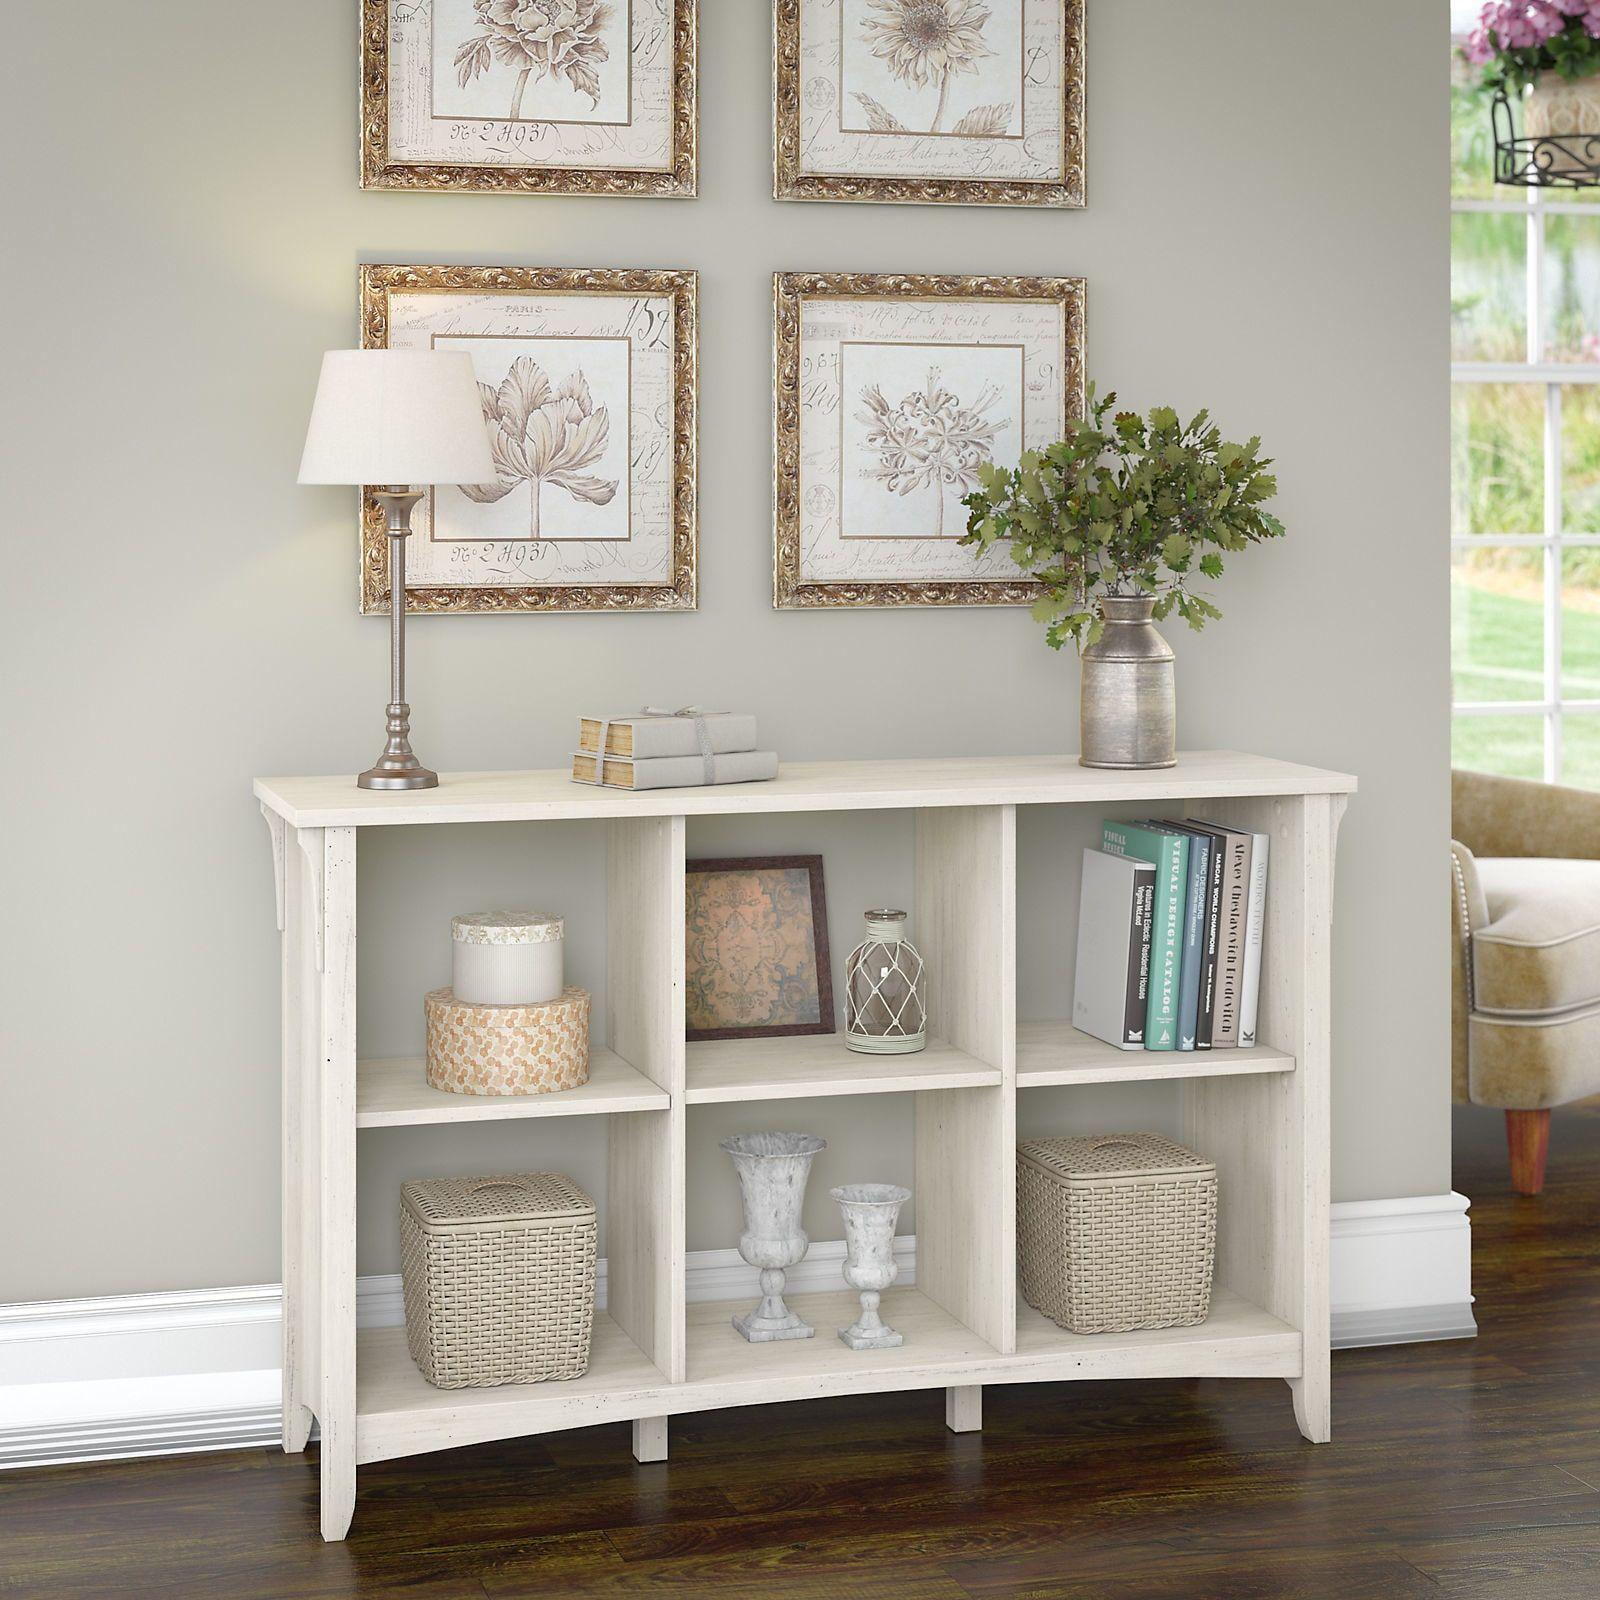 Superb Bush Furniture Salinas 6 Cube Organizer In Antique White (6 Cube Storage)